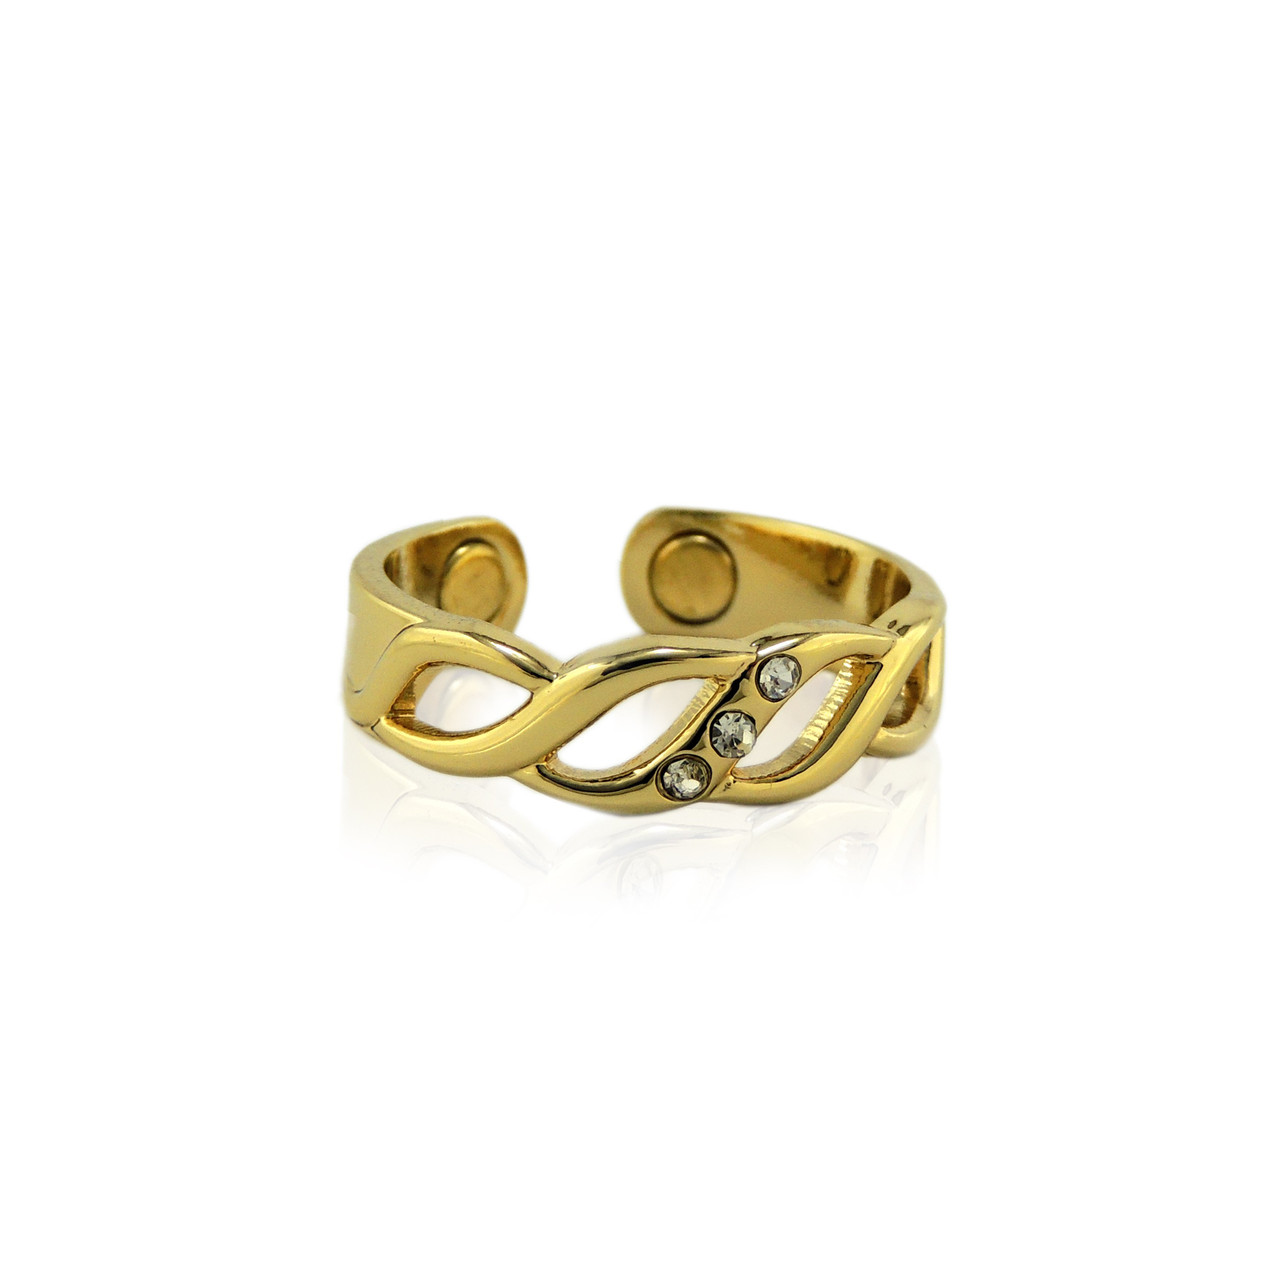 C-KCR07 Copper Ring